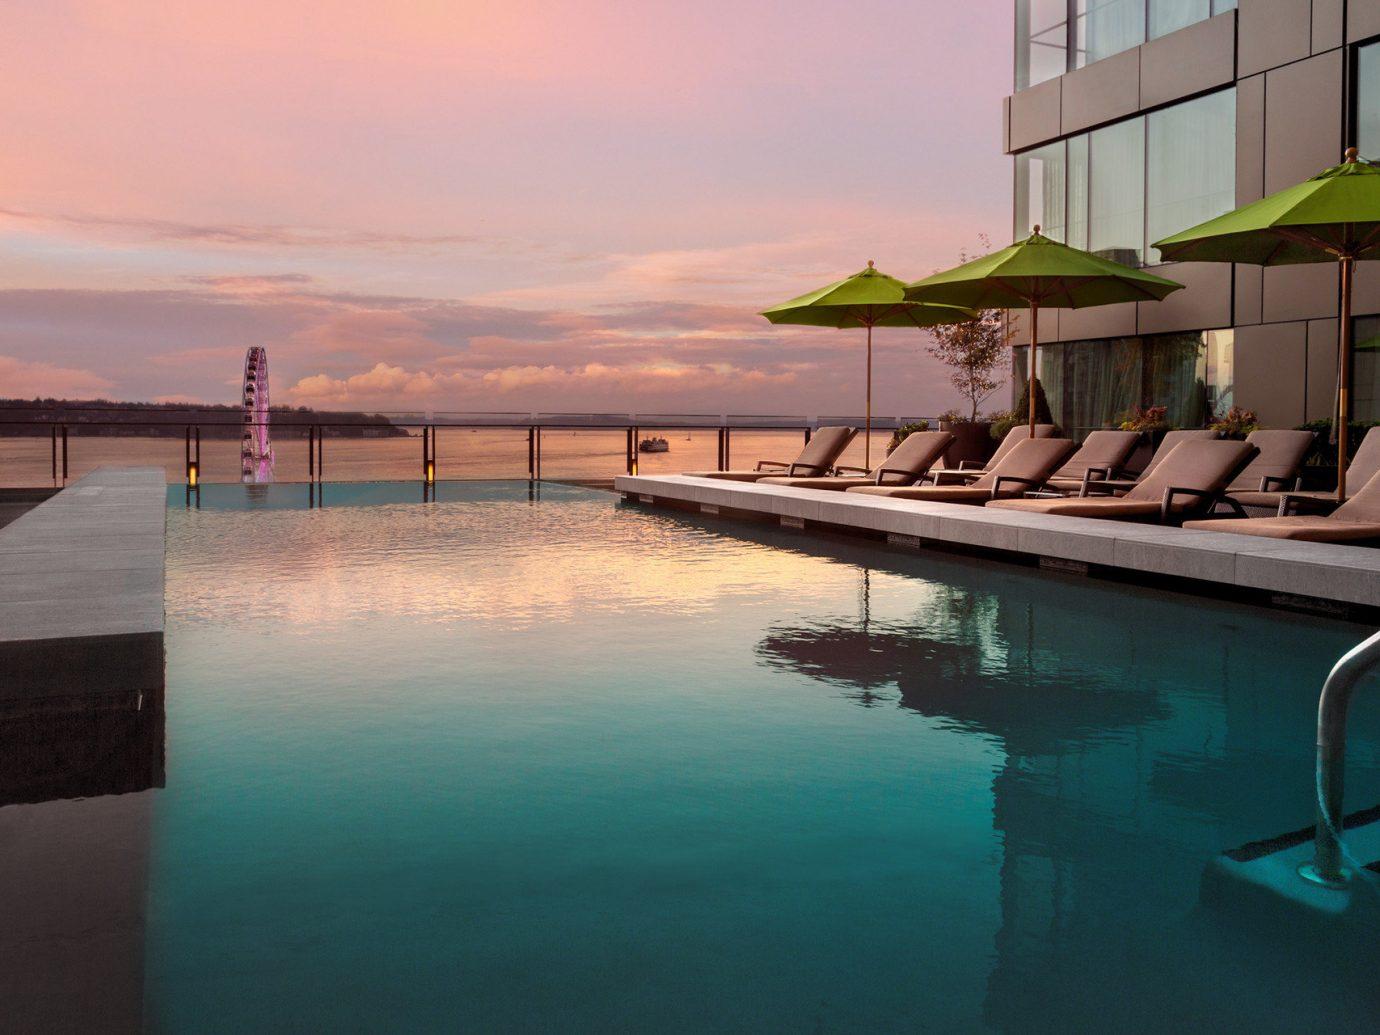 Hotels water sky outdoor swimming pool property scene vacation Sea Ocean Resort estate condominium dock Villa lined several